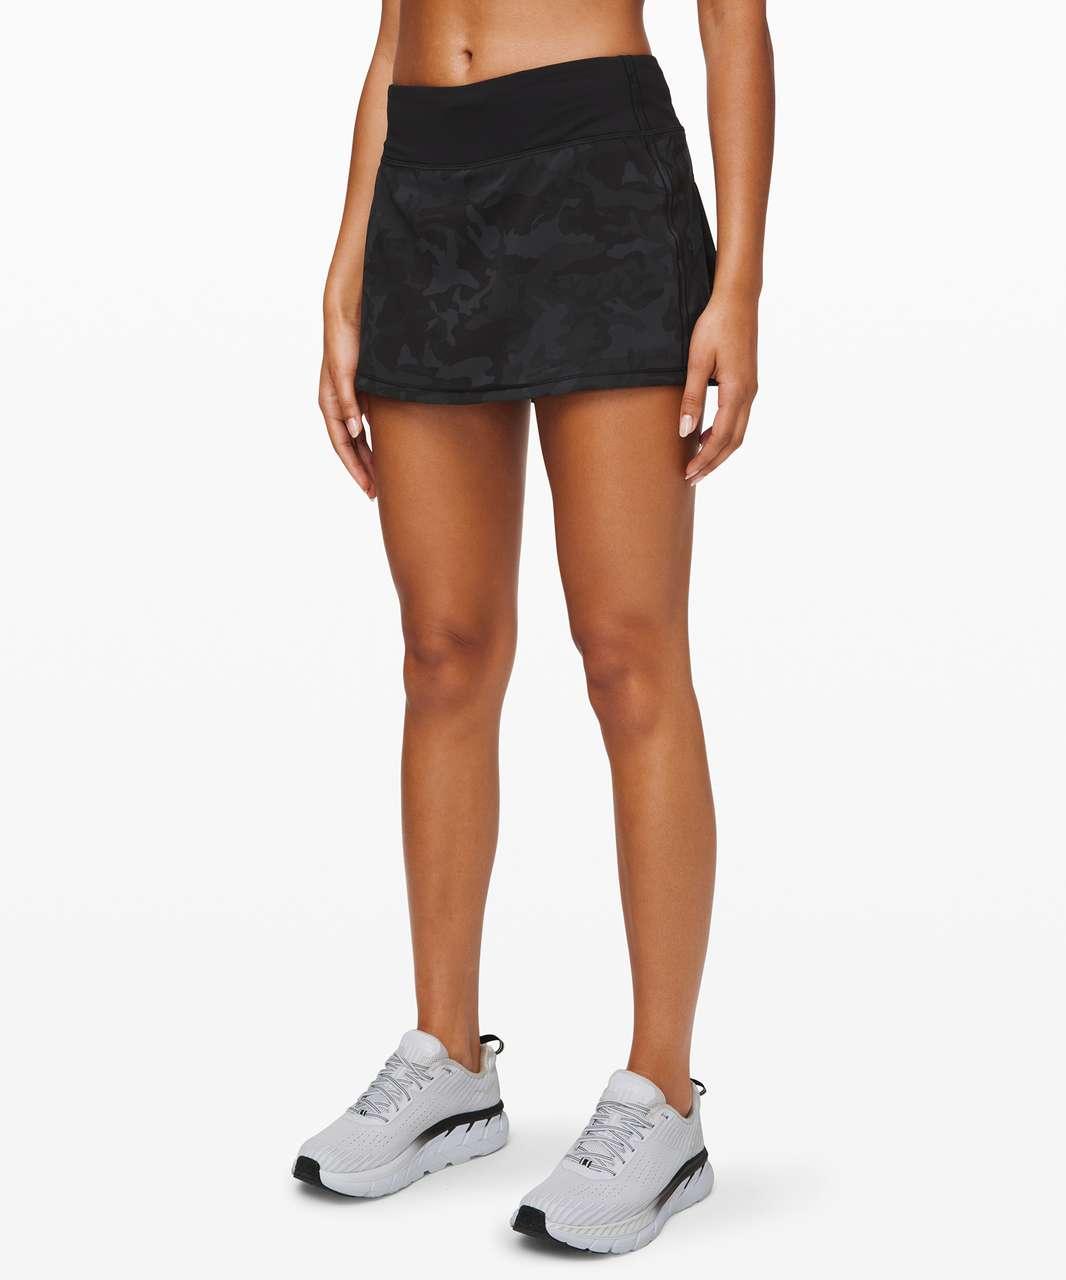 "Lululemon Pace Rival Skirt (Regular) *No Panels 13"" - Incognito Camo Multi Grey / Black"